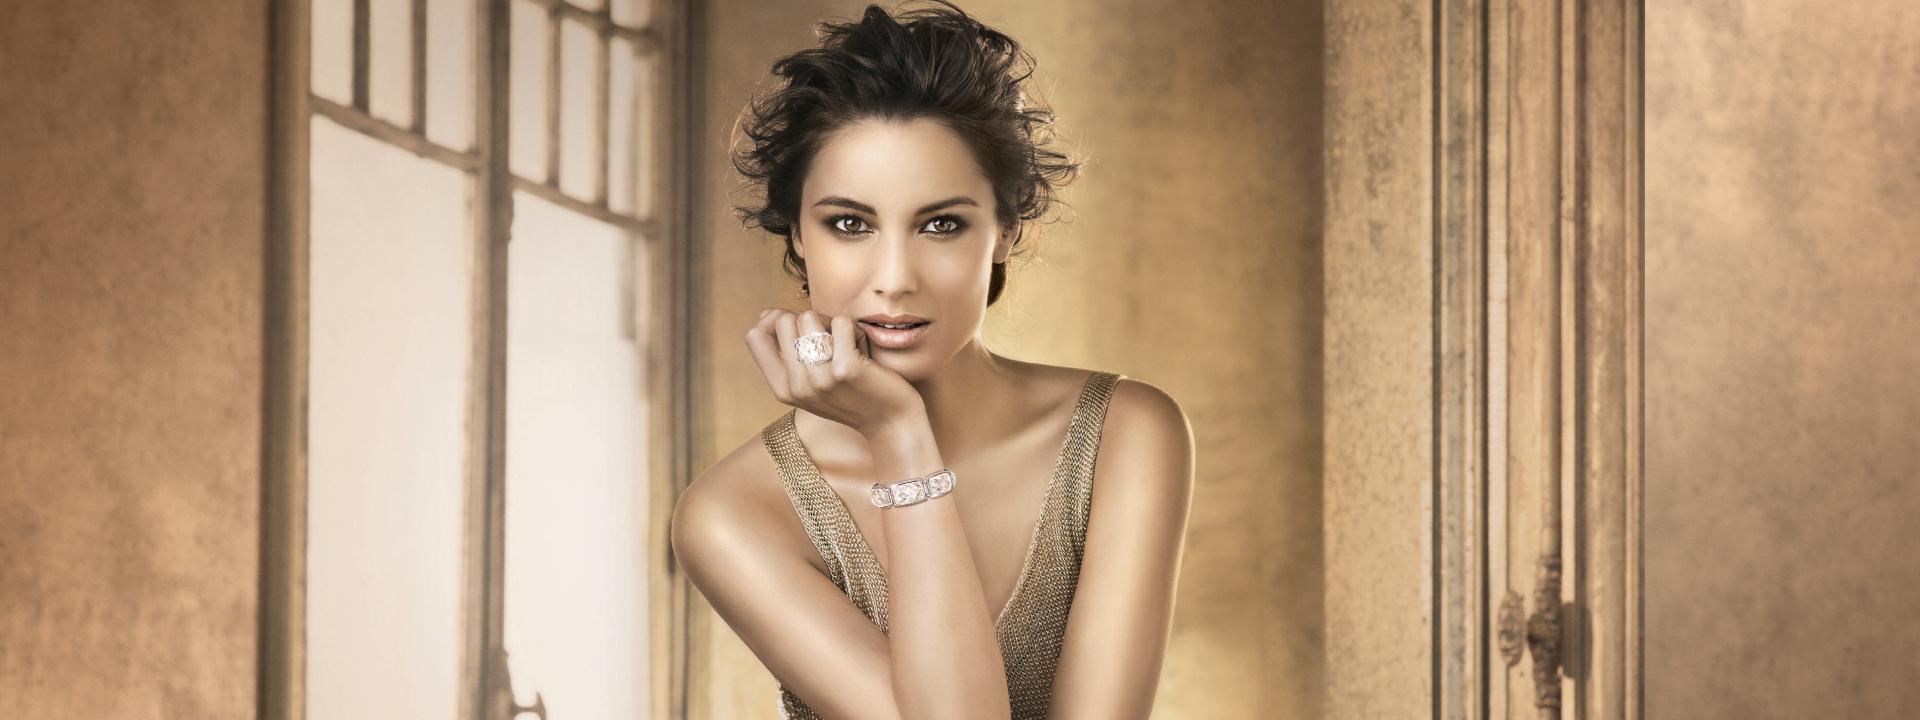 Diamond dress rings - gemstone fashion rings